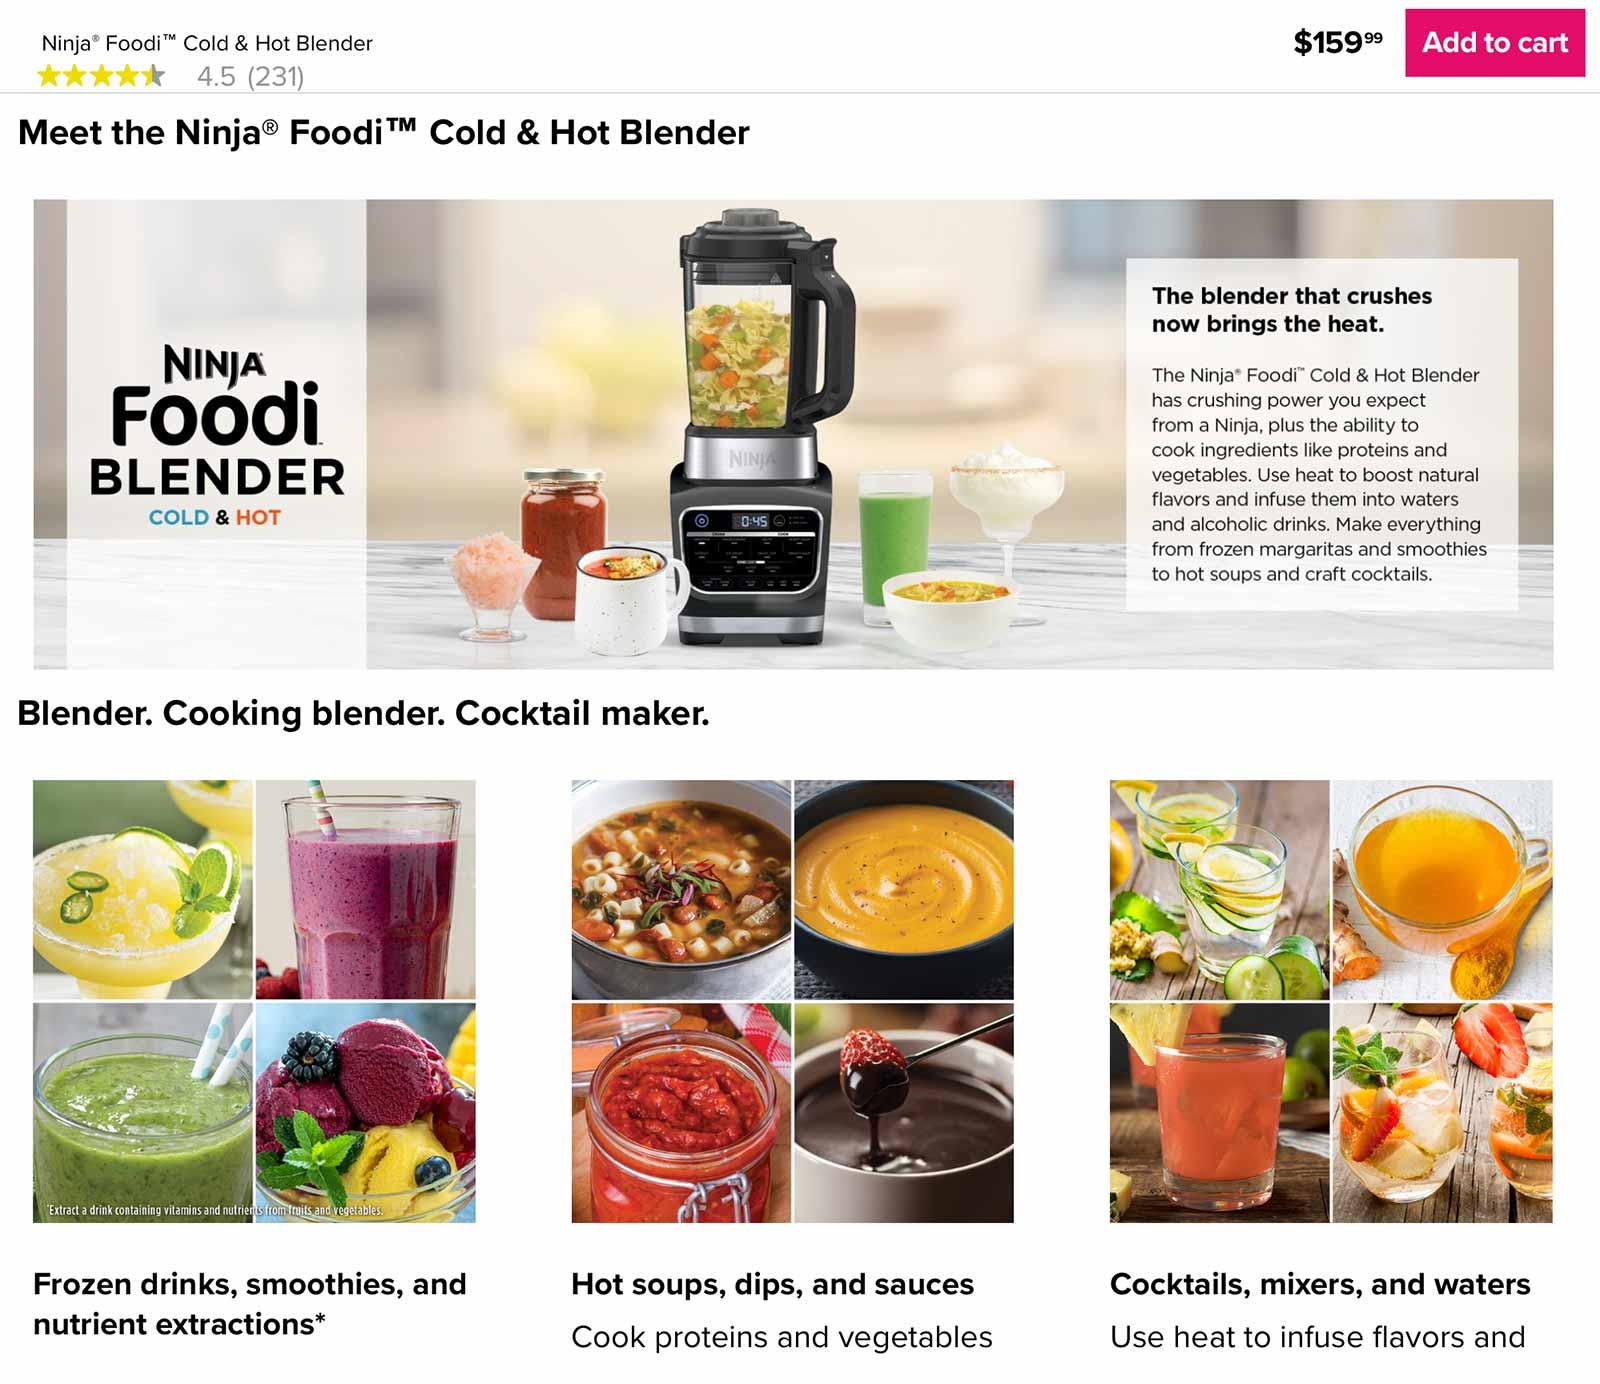 Ninja Foodi Blender page